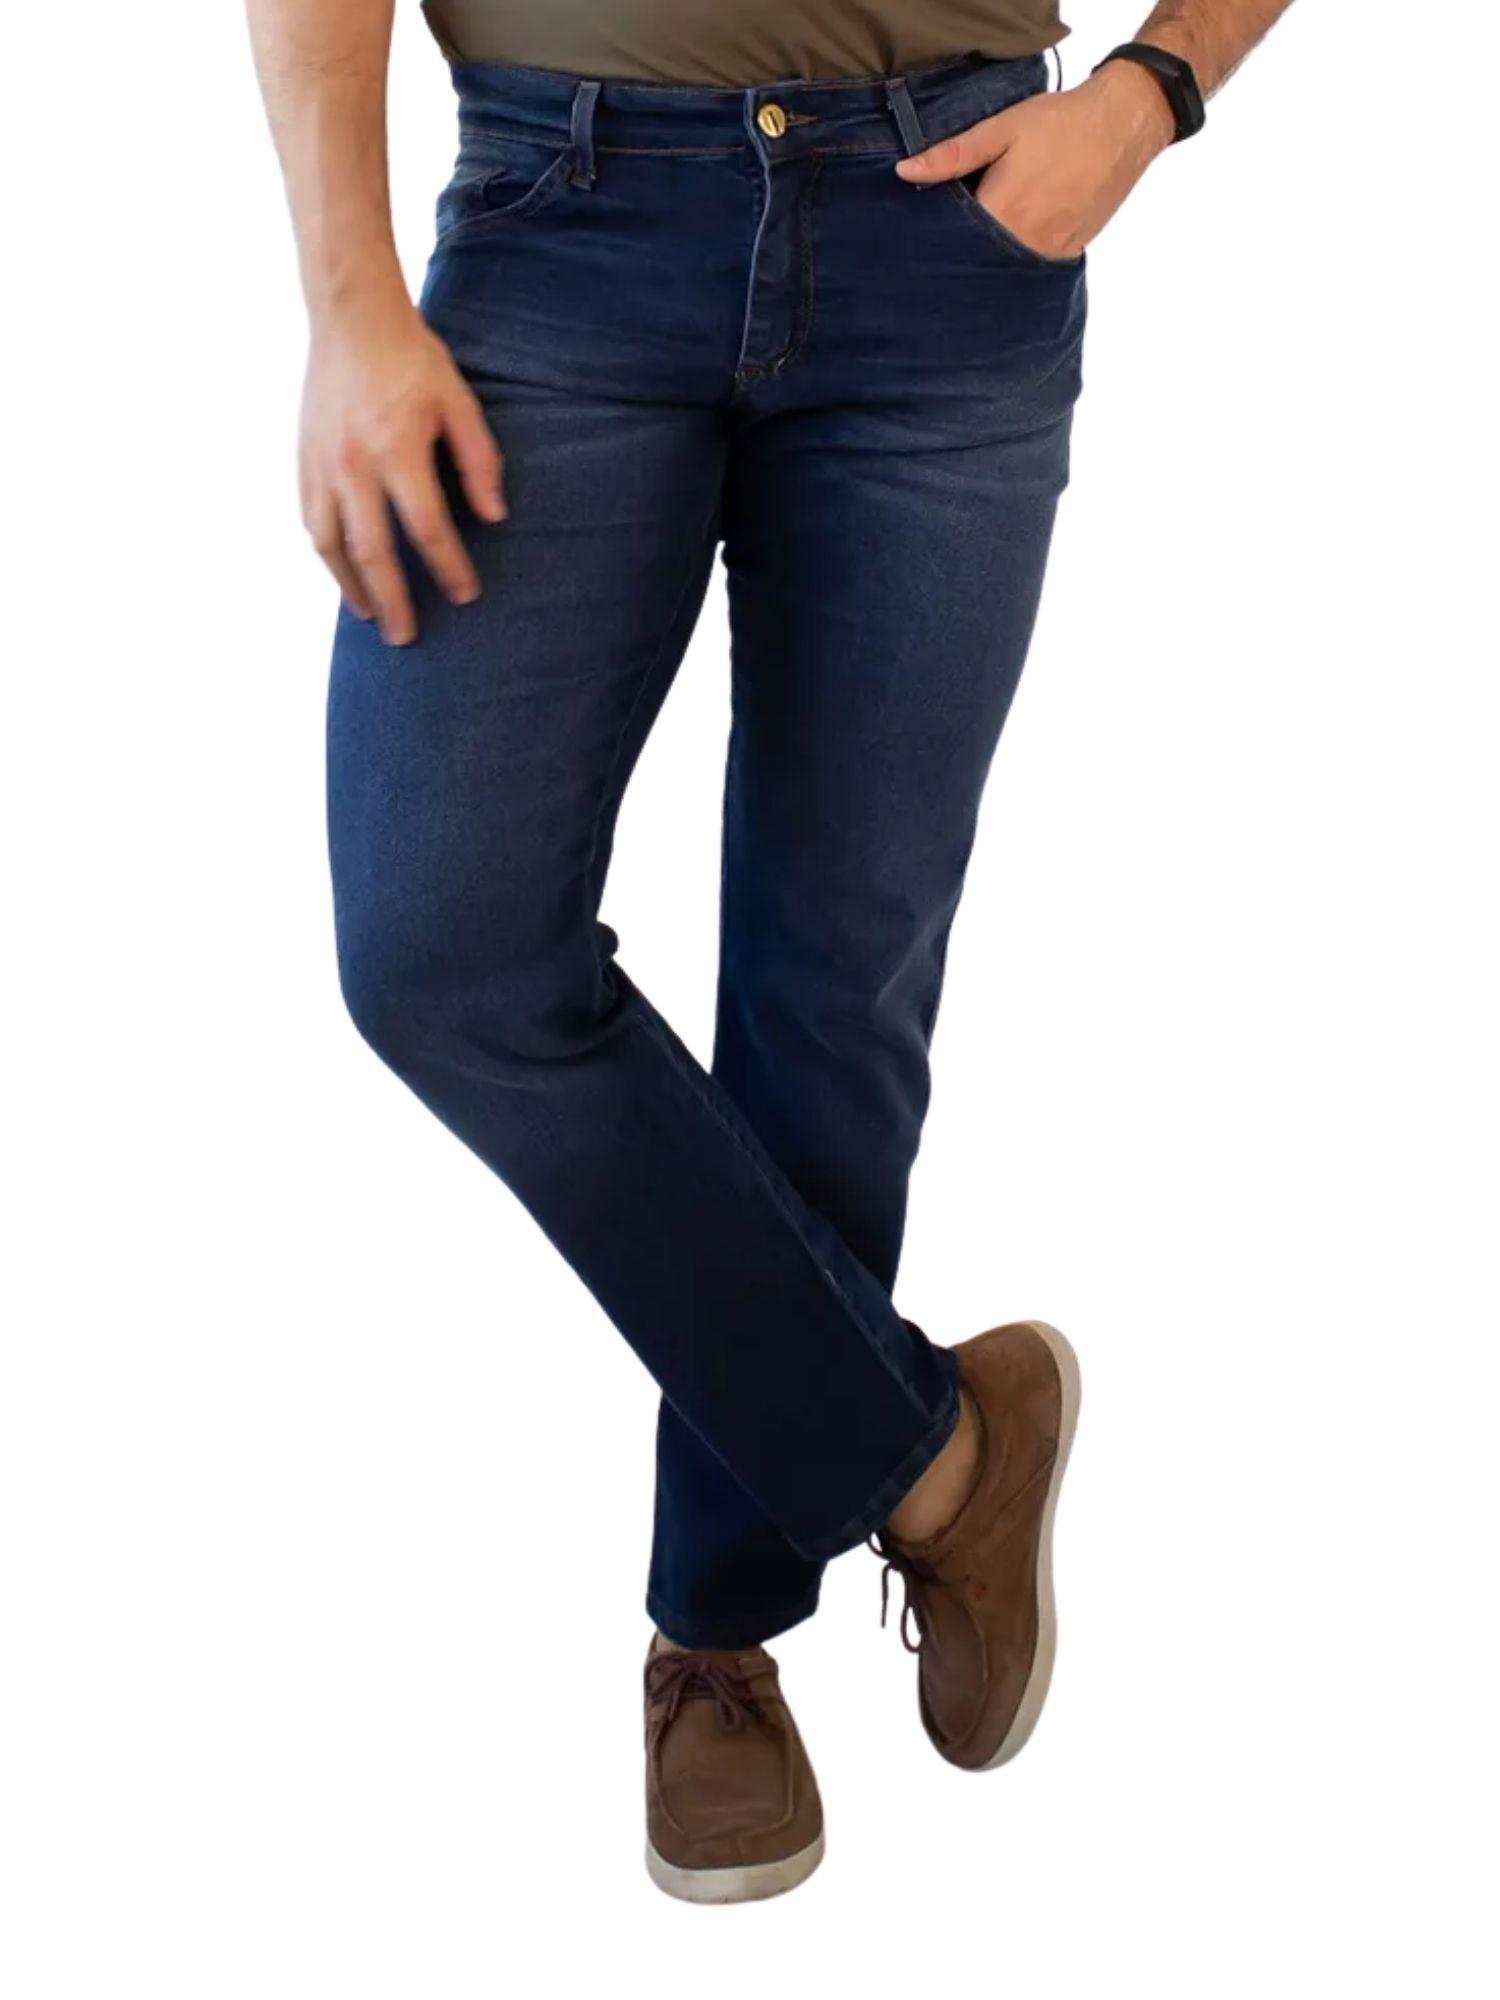 Calça Masculina Slim Anticorpus  22408